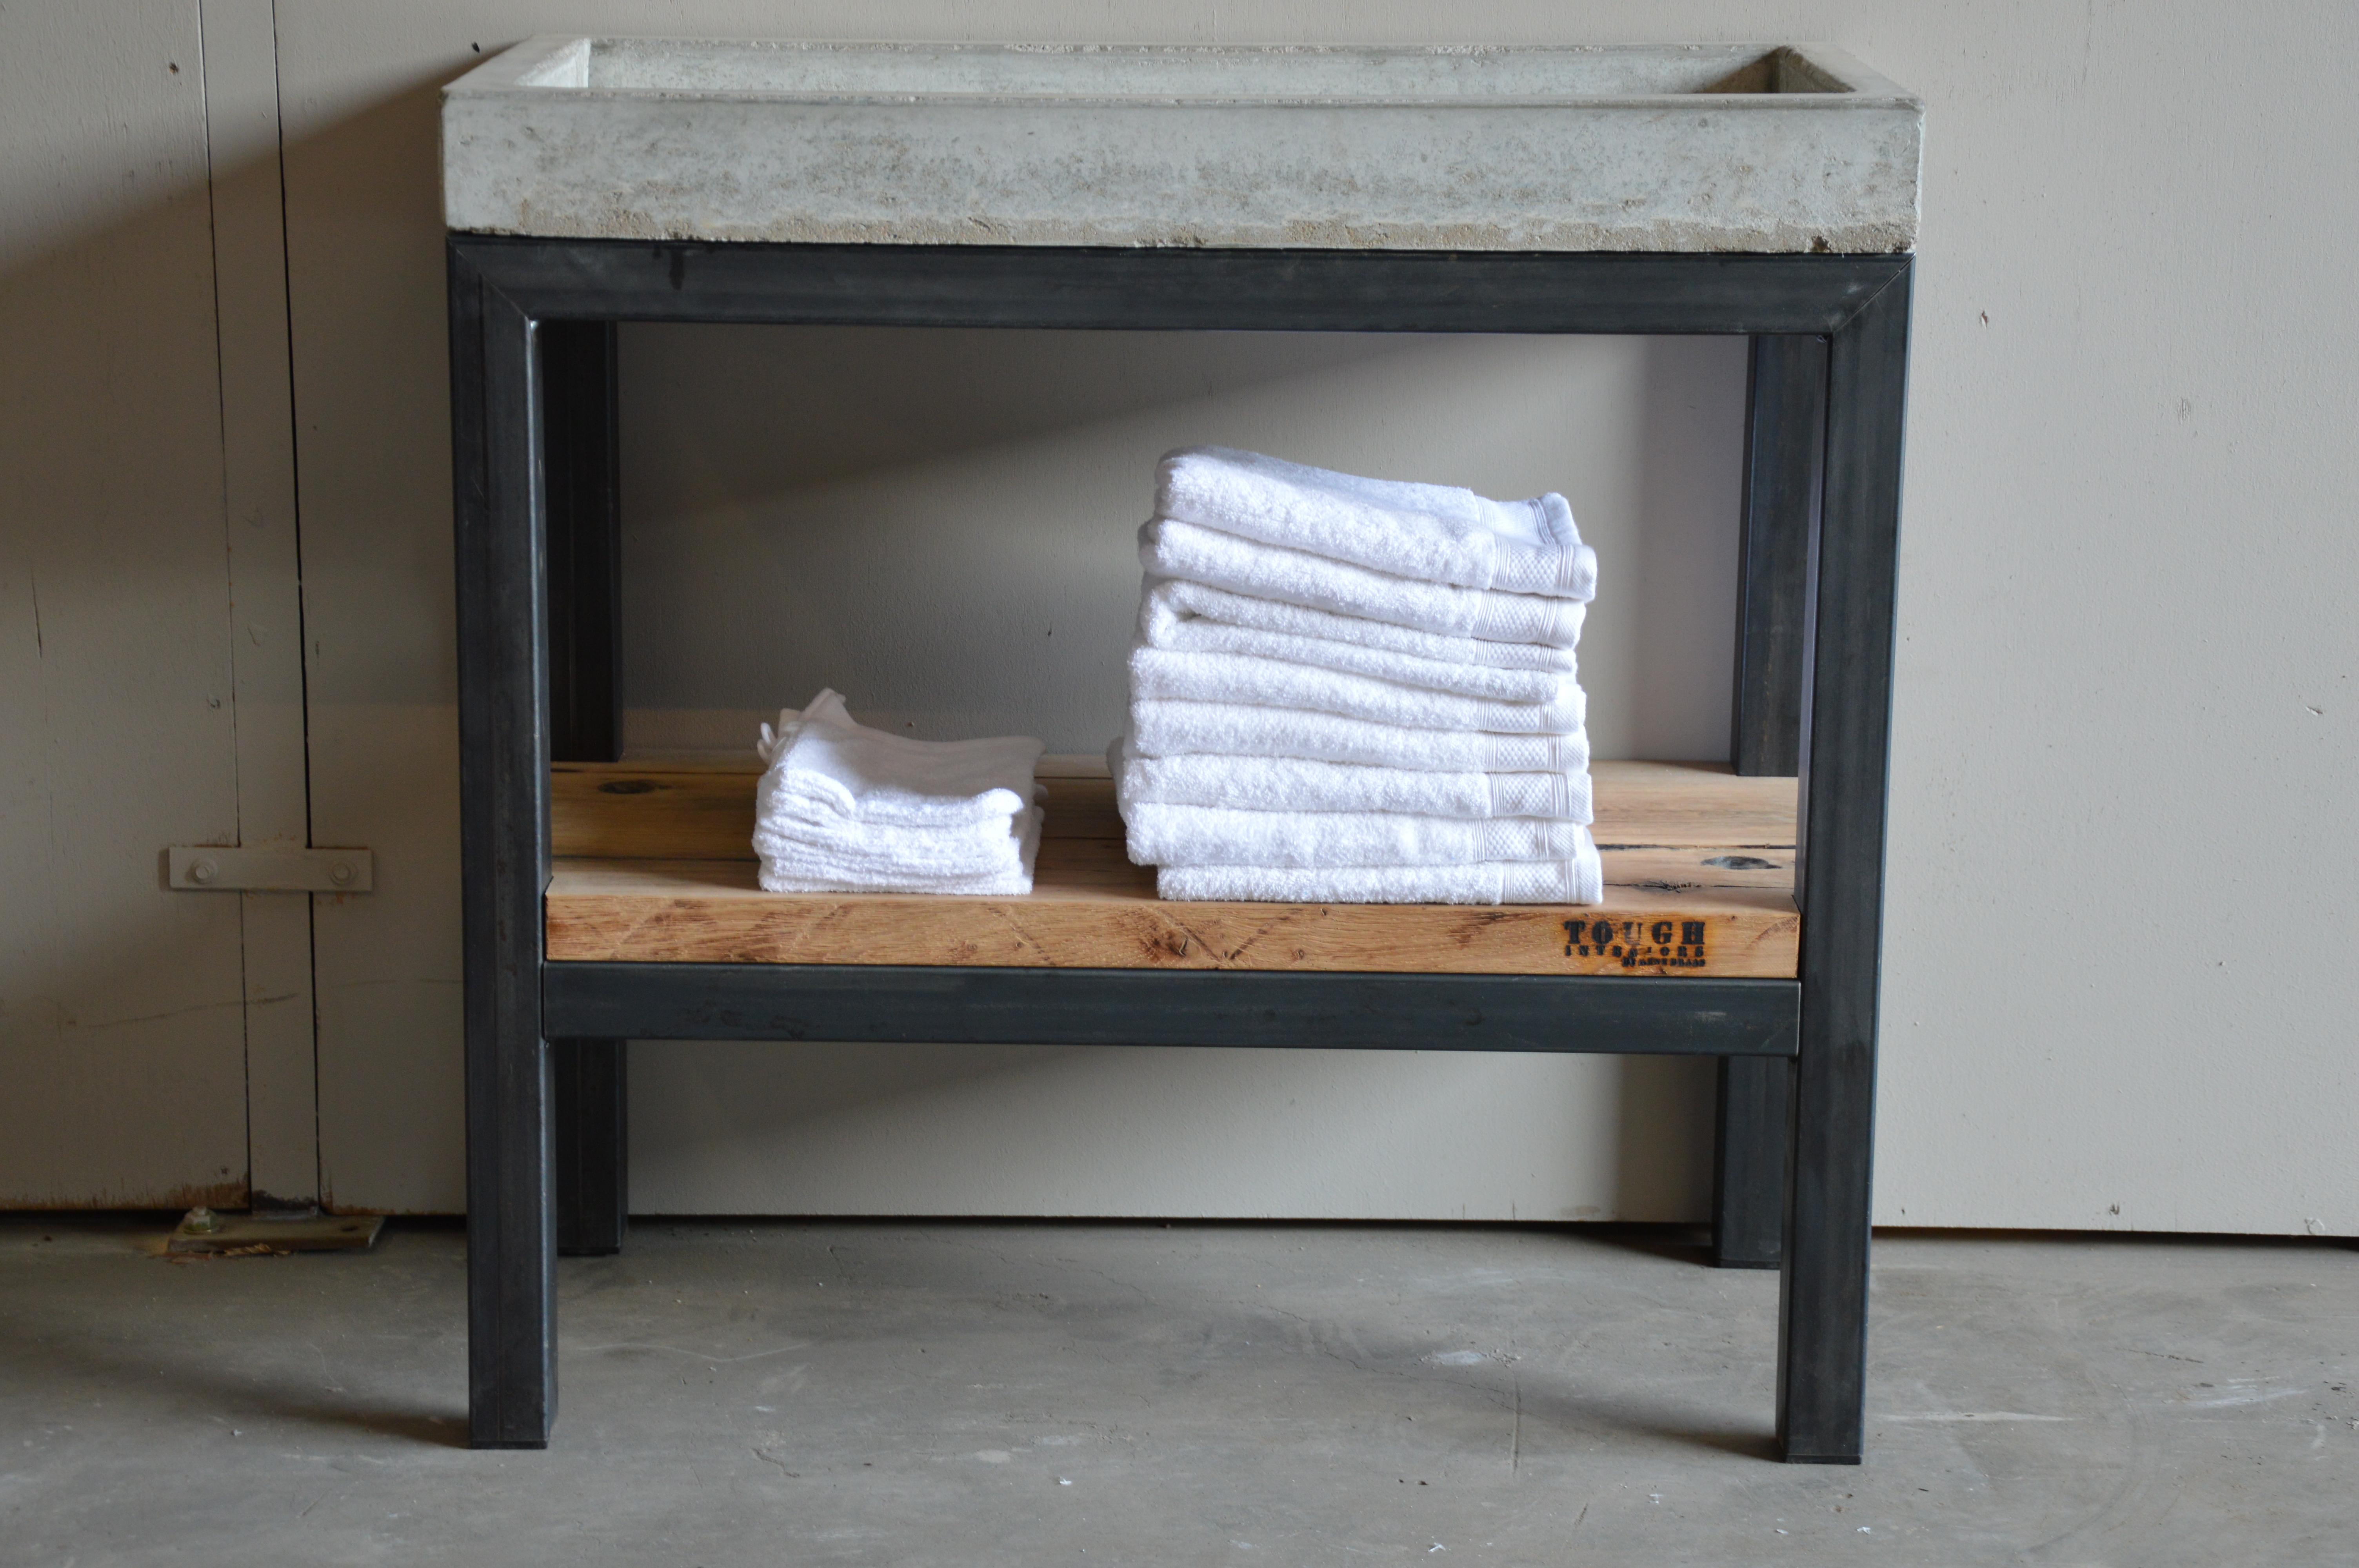 Wastafel Van Beton : Wastafel beton en staal rene braas timmerwerken